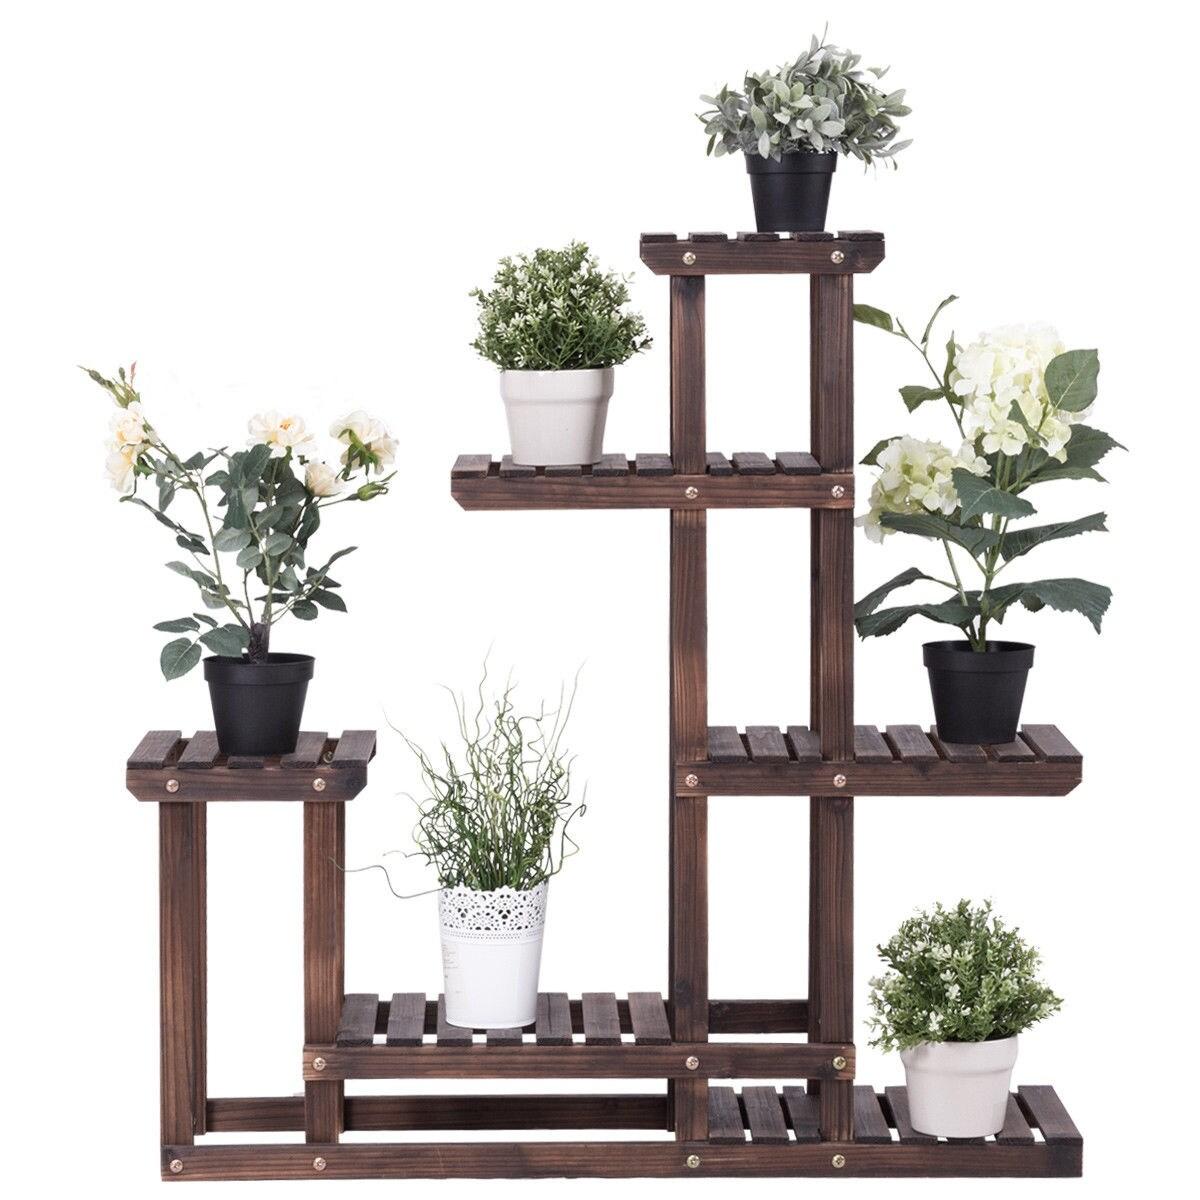 Costway Outdoor Wooden Plant Flower Display Stand 6 Wood Shelf Storage Rack  Garden - Free Shipping Today - Overstock.com - 24647853